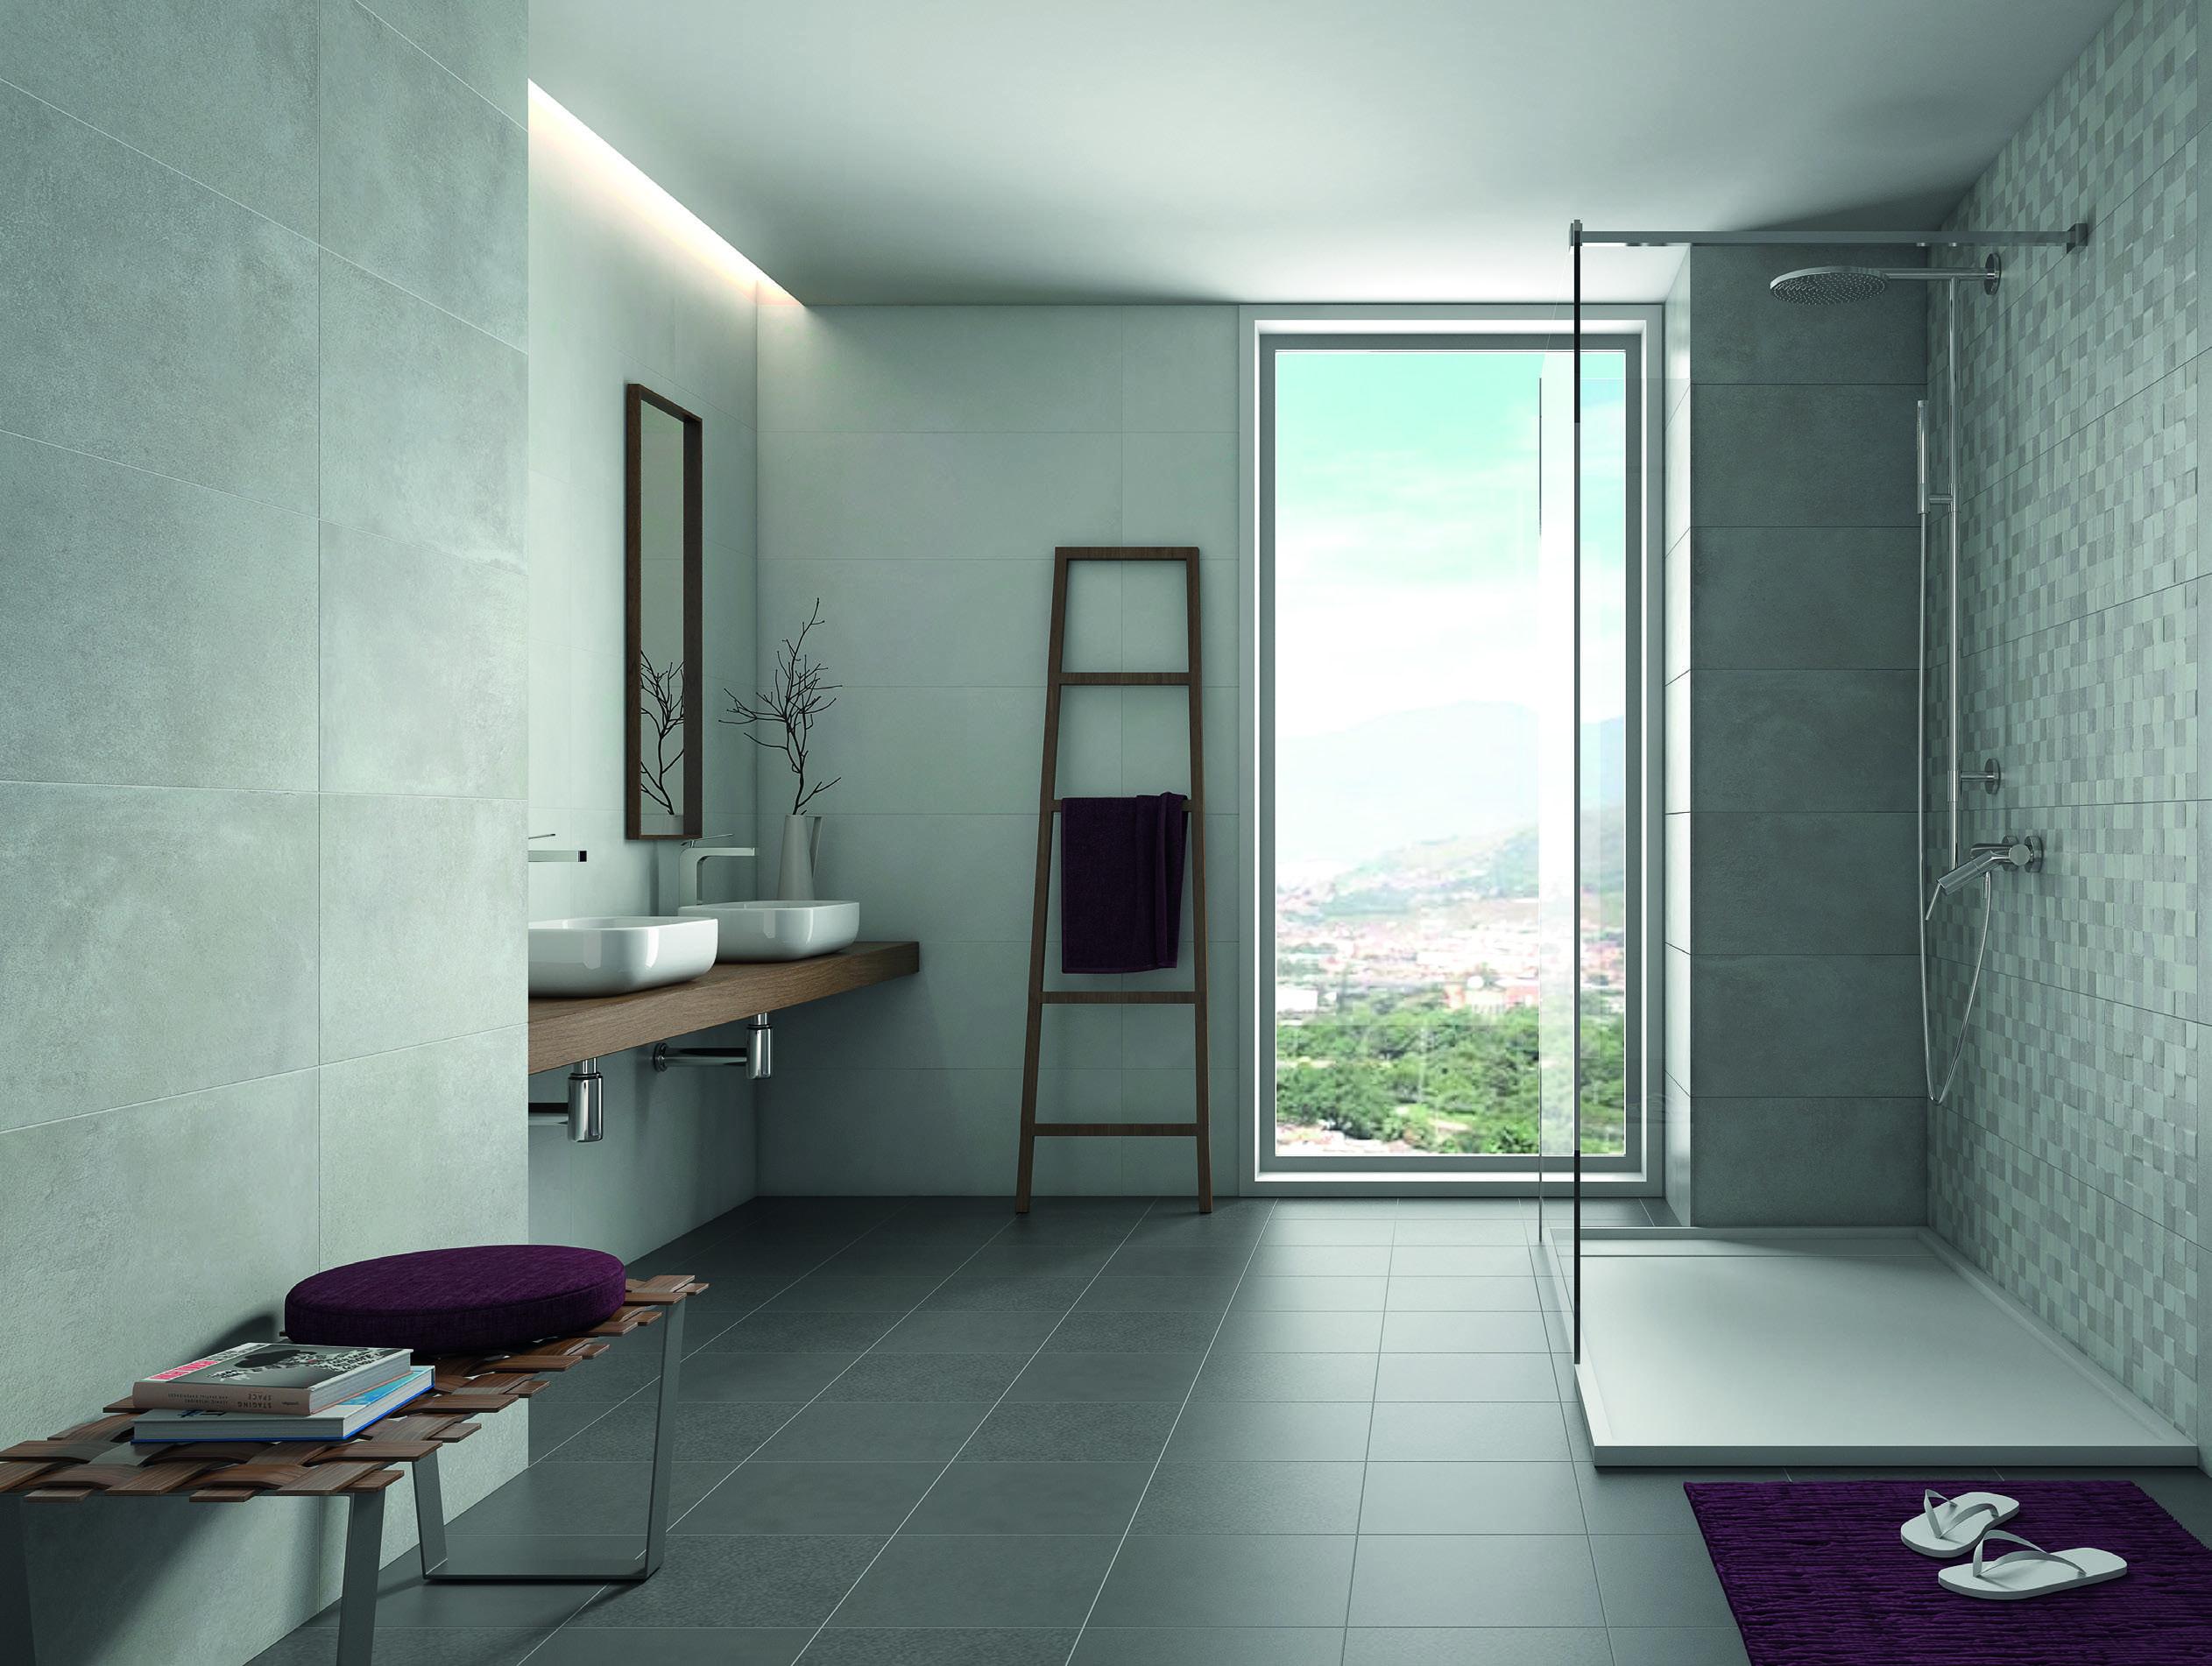 Serie 33 55 studio azulejos y pavimentos mart n - Azulejos martin ...